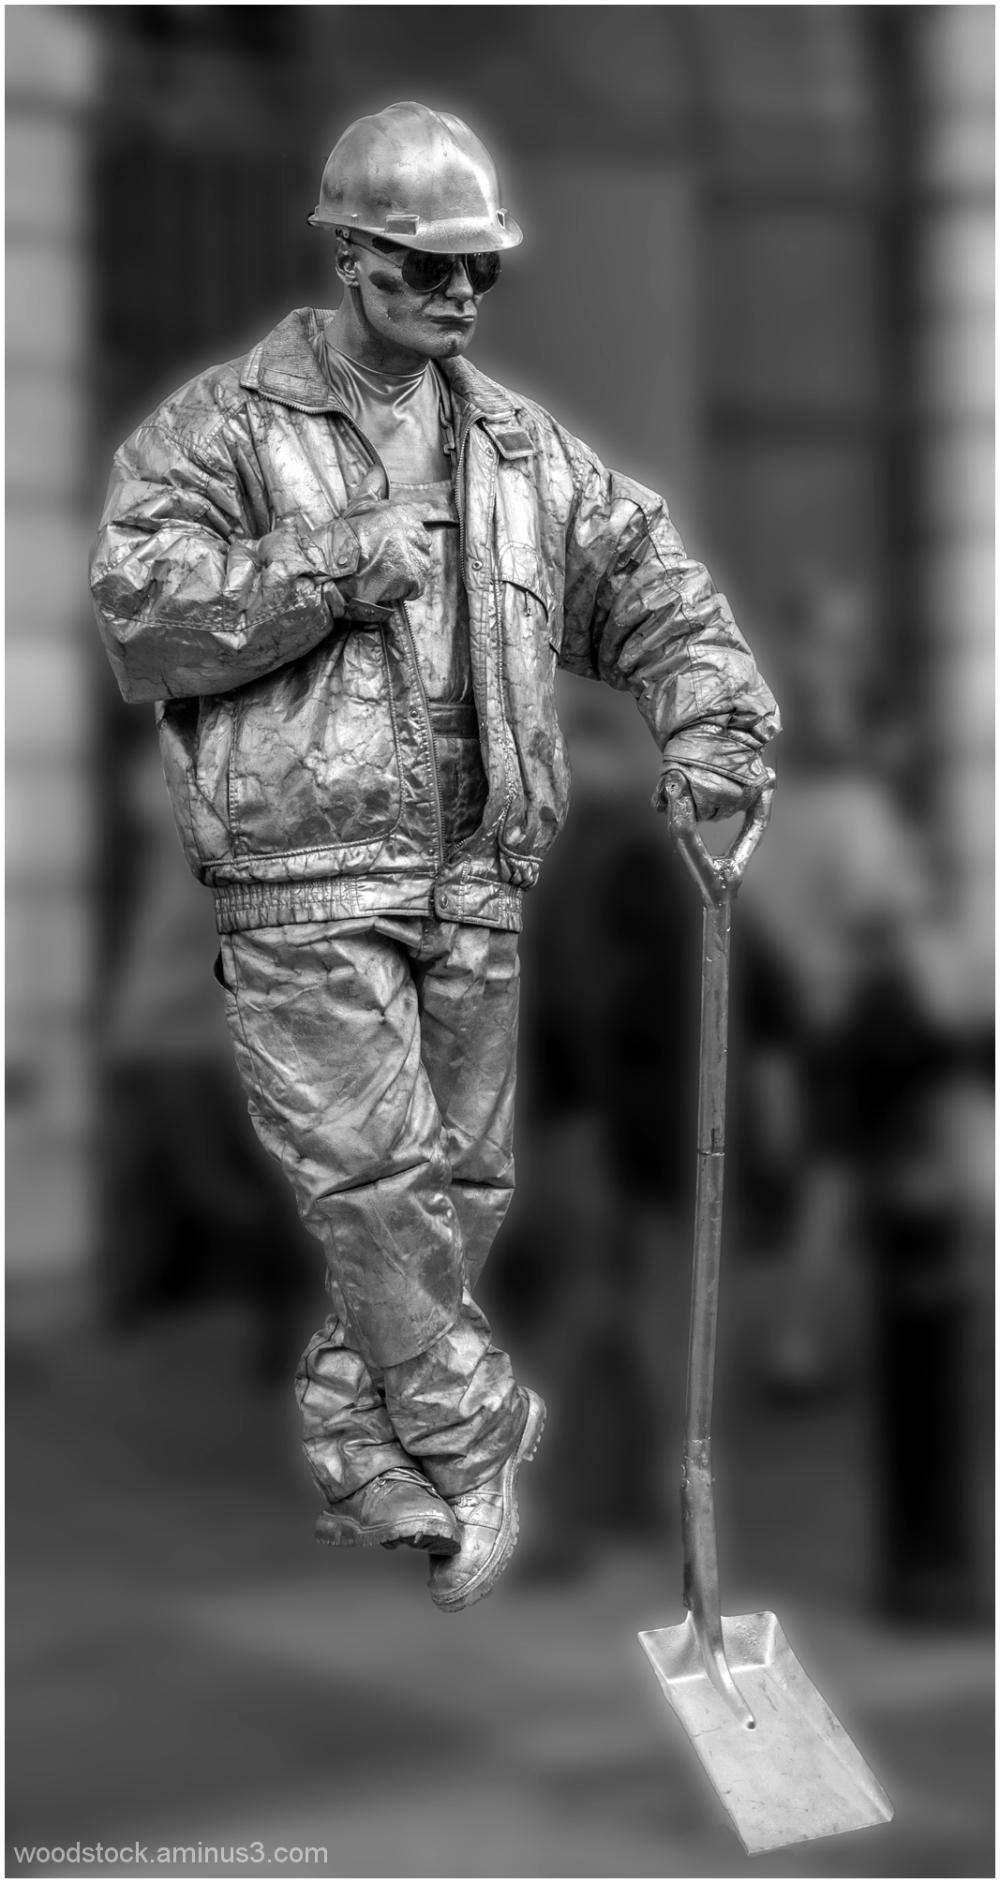 Covent Garden - Human Statue